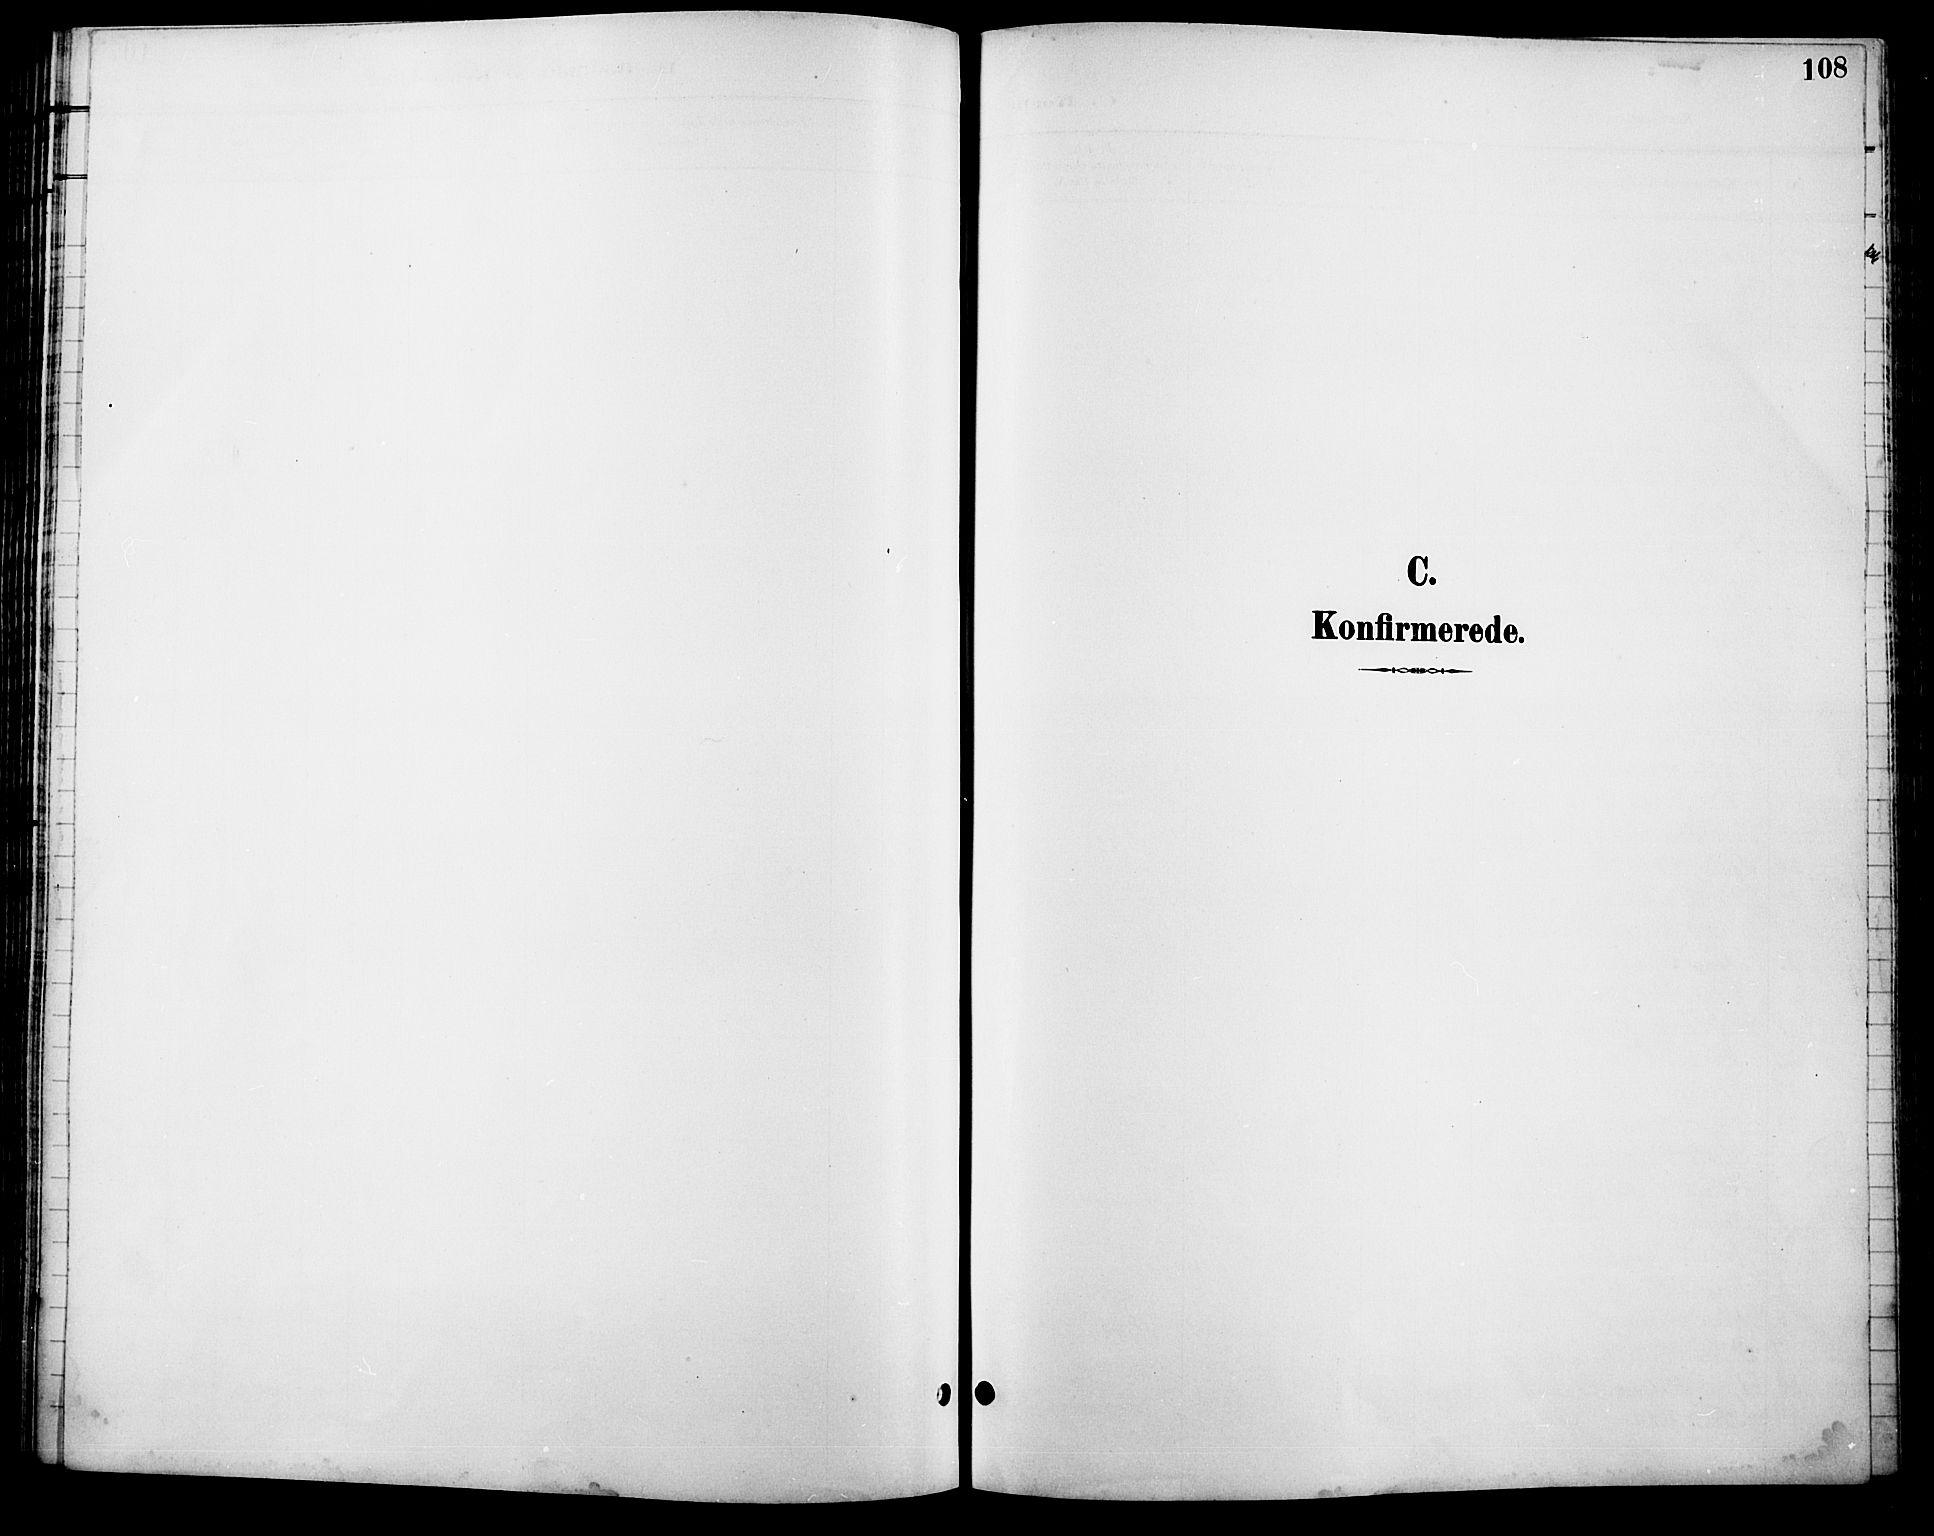 SAH, Lesja prestekontor, Klokkerbok nr. 7, 1895-1919, s. 108